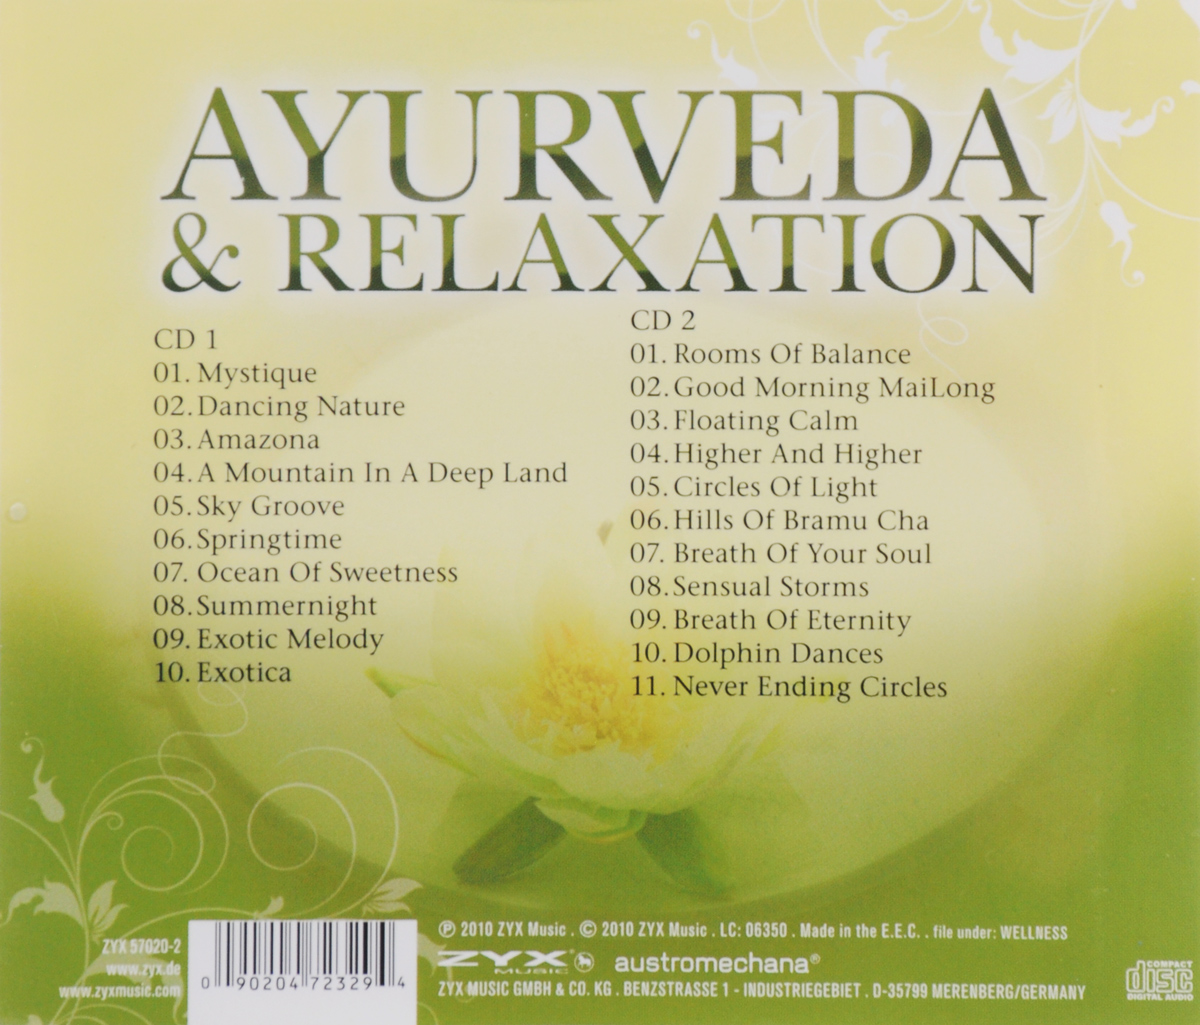 Ayurveda& Relaxation (2 CD) Волтэкс-инвест,ZYX Music